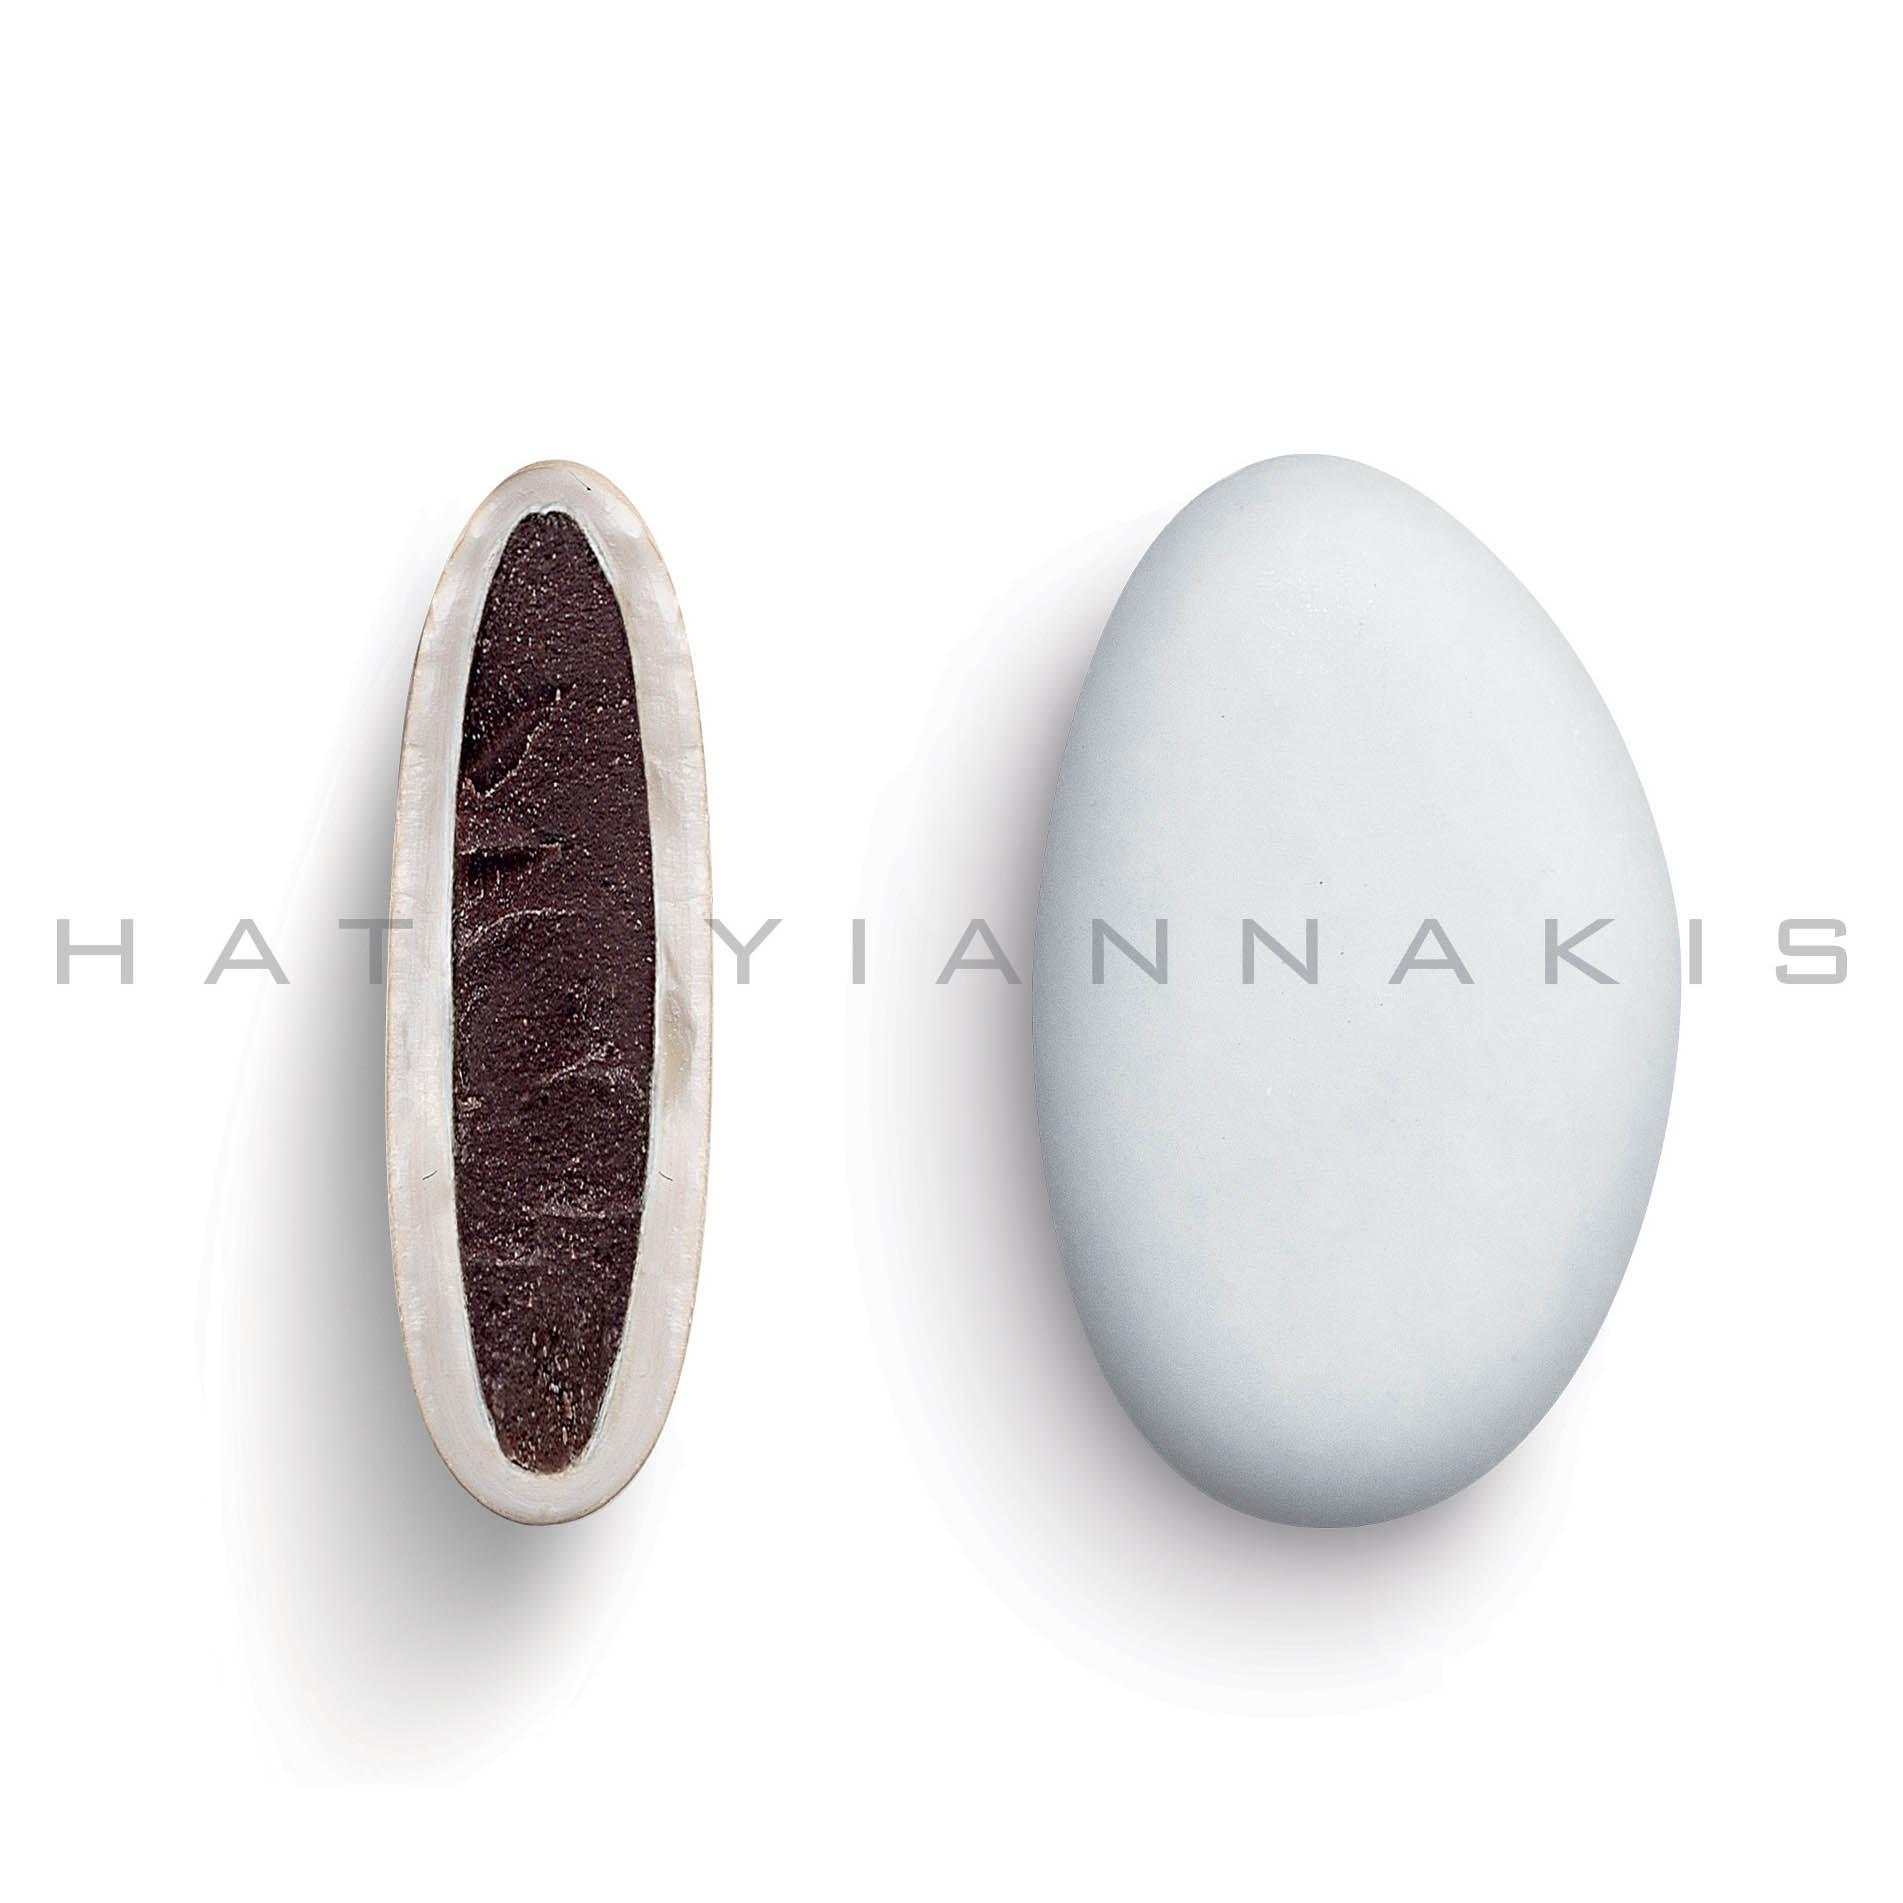 Bijoux κουφέτο σοκολάτας λευκό ματ